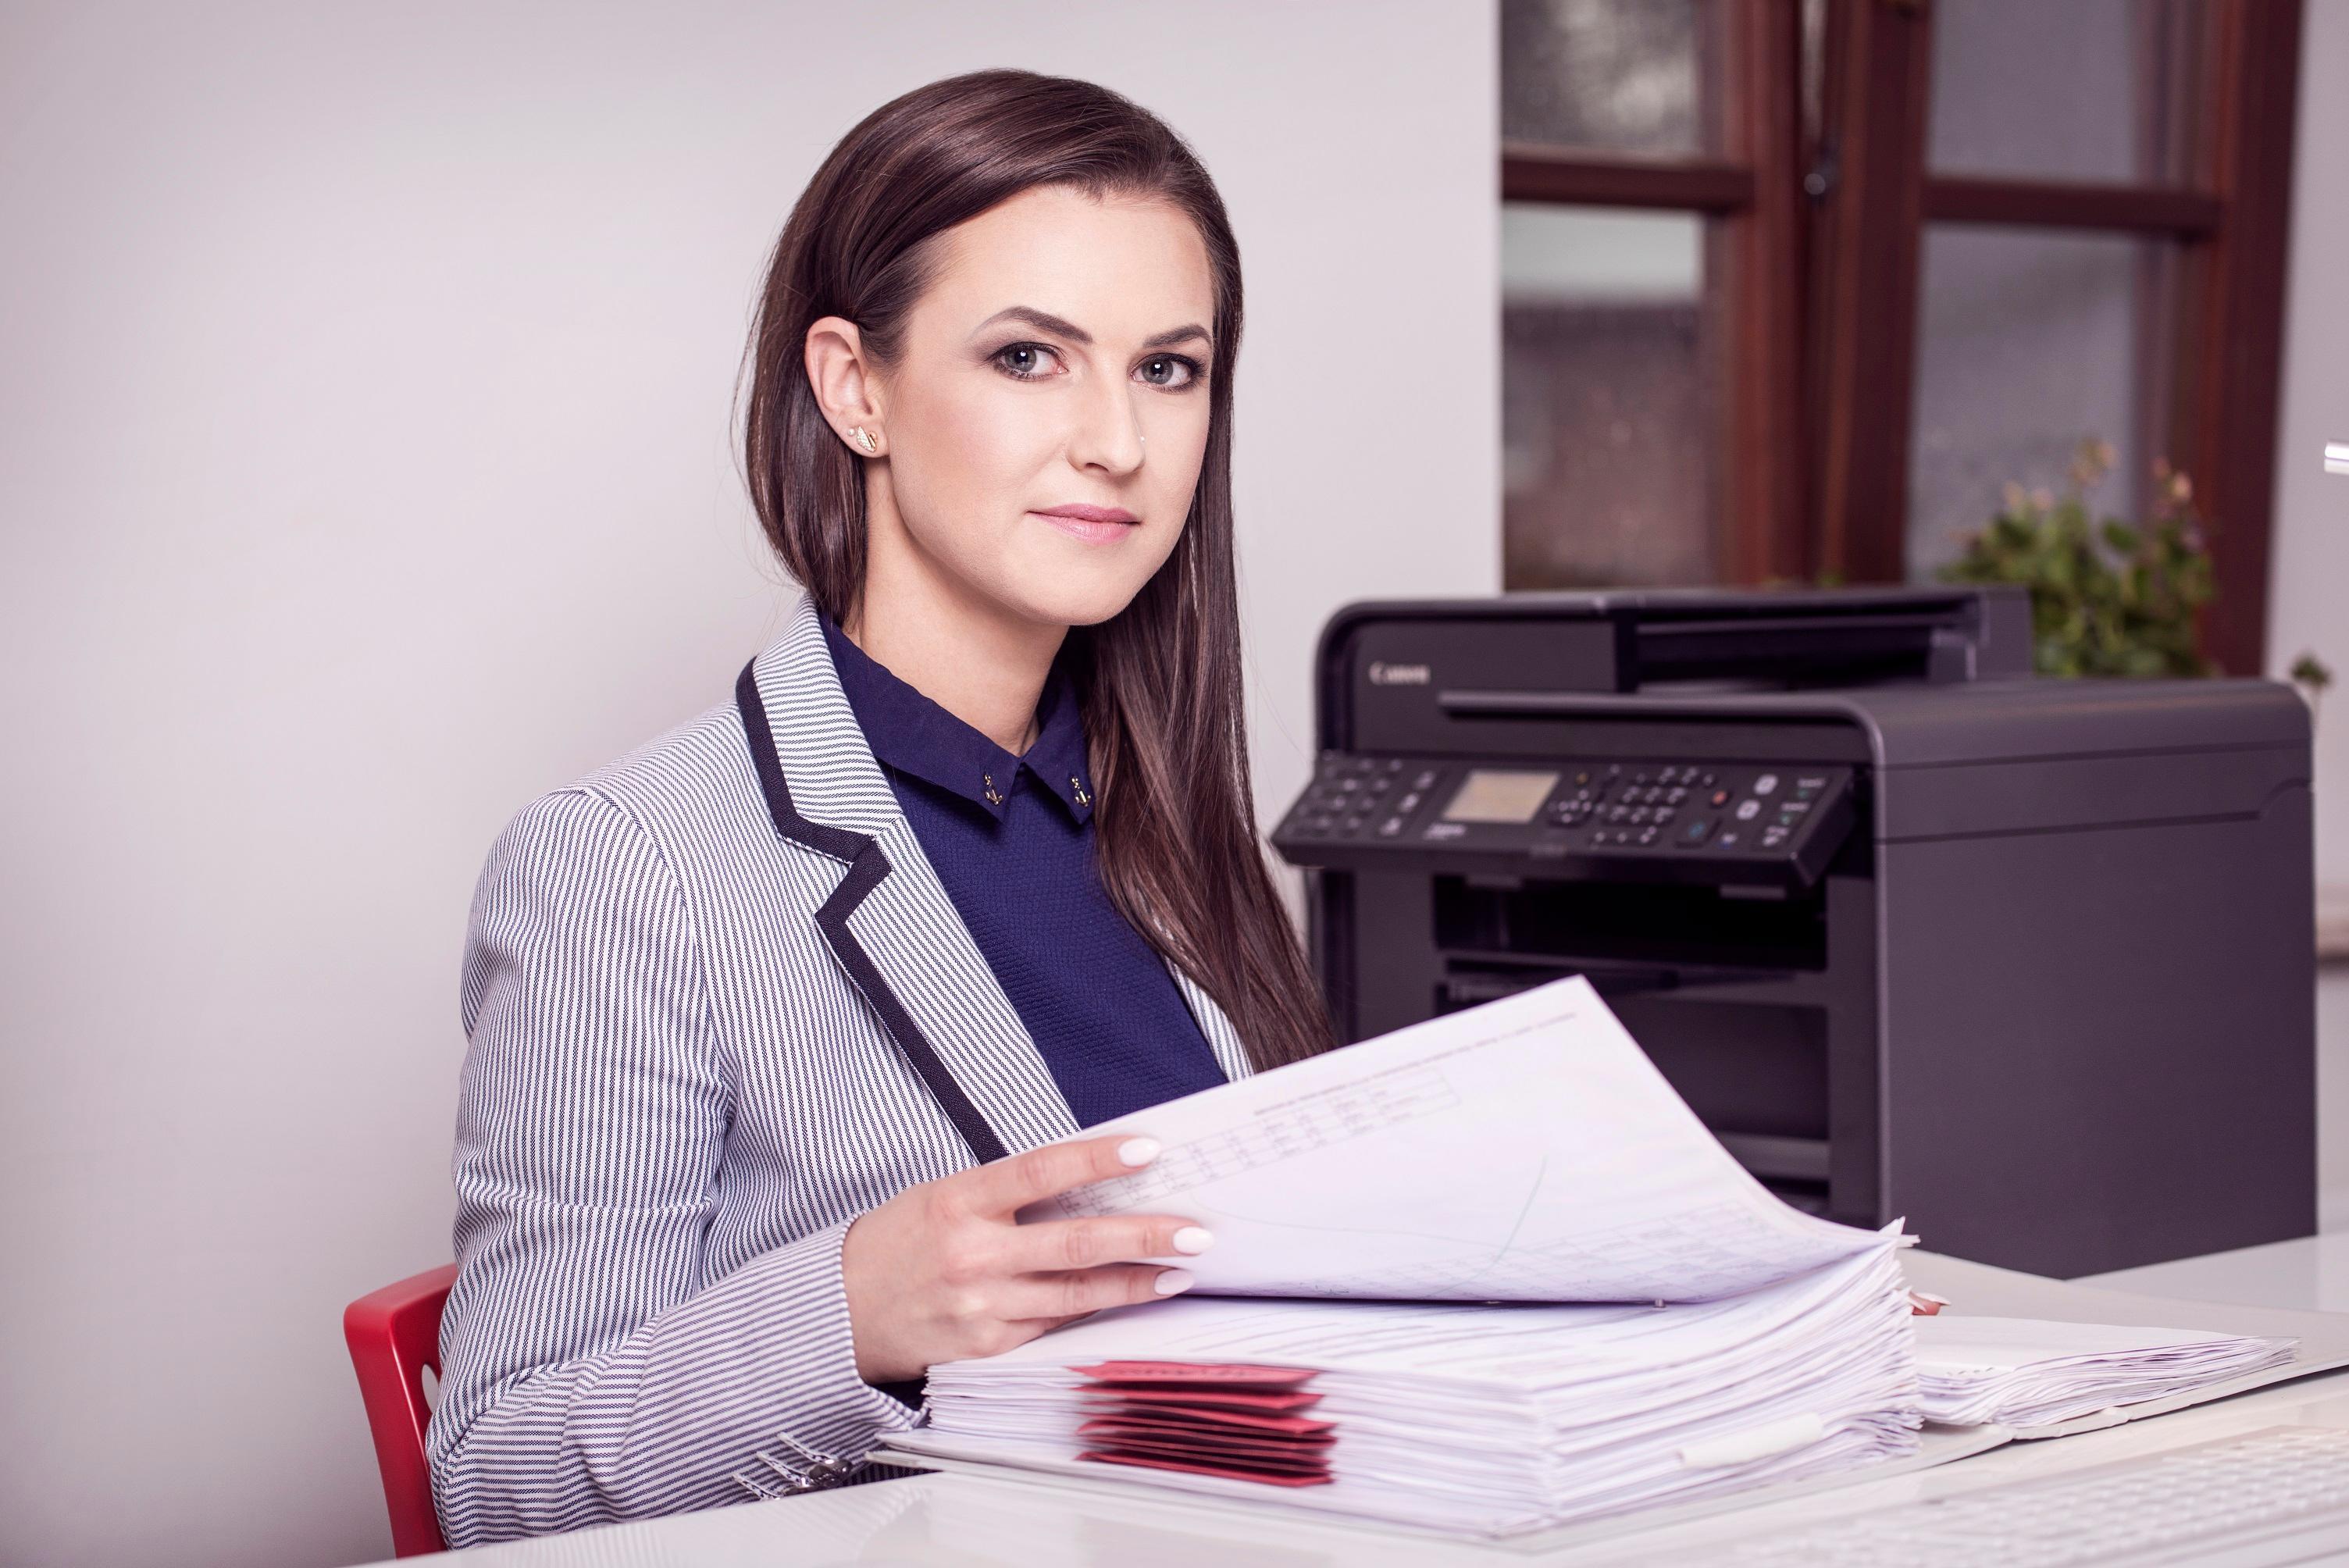 работа бухгалтера на дому оплата